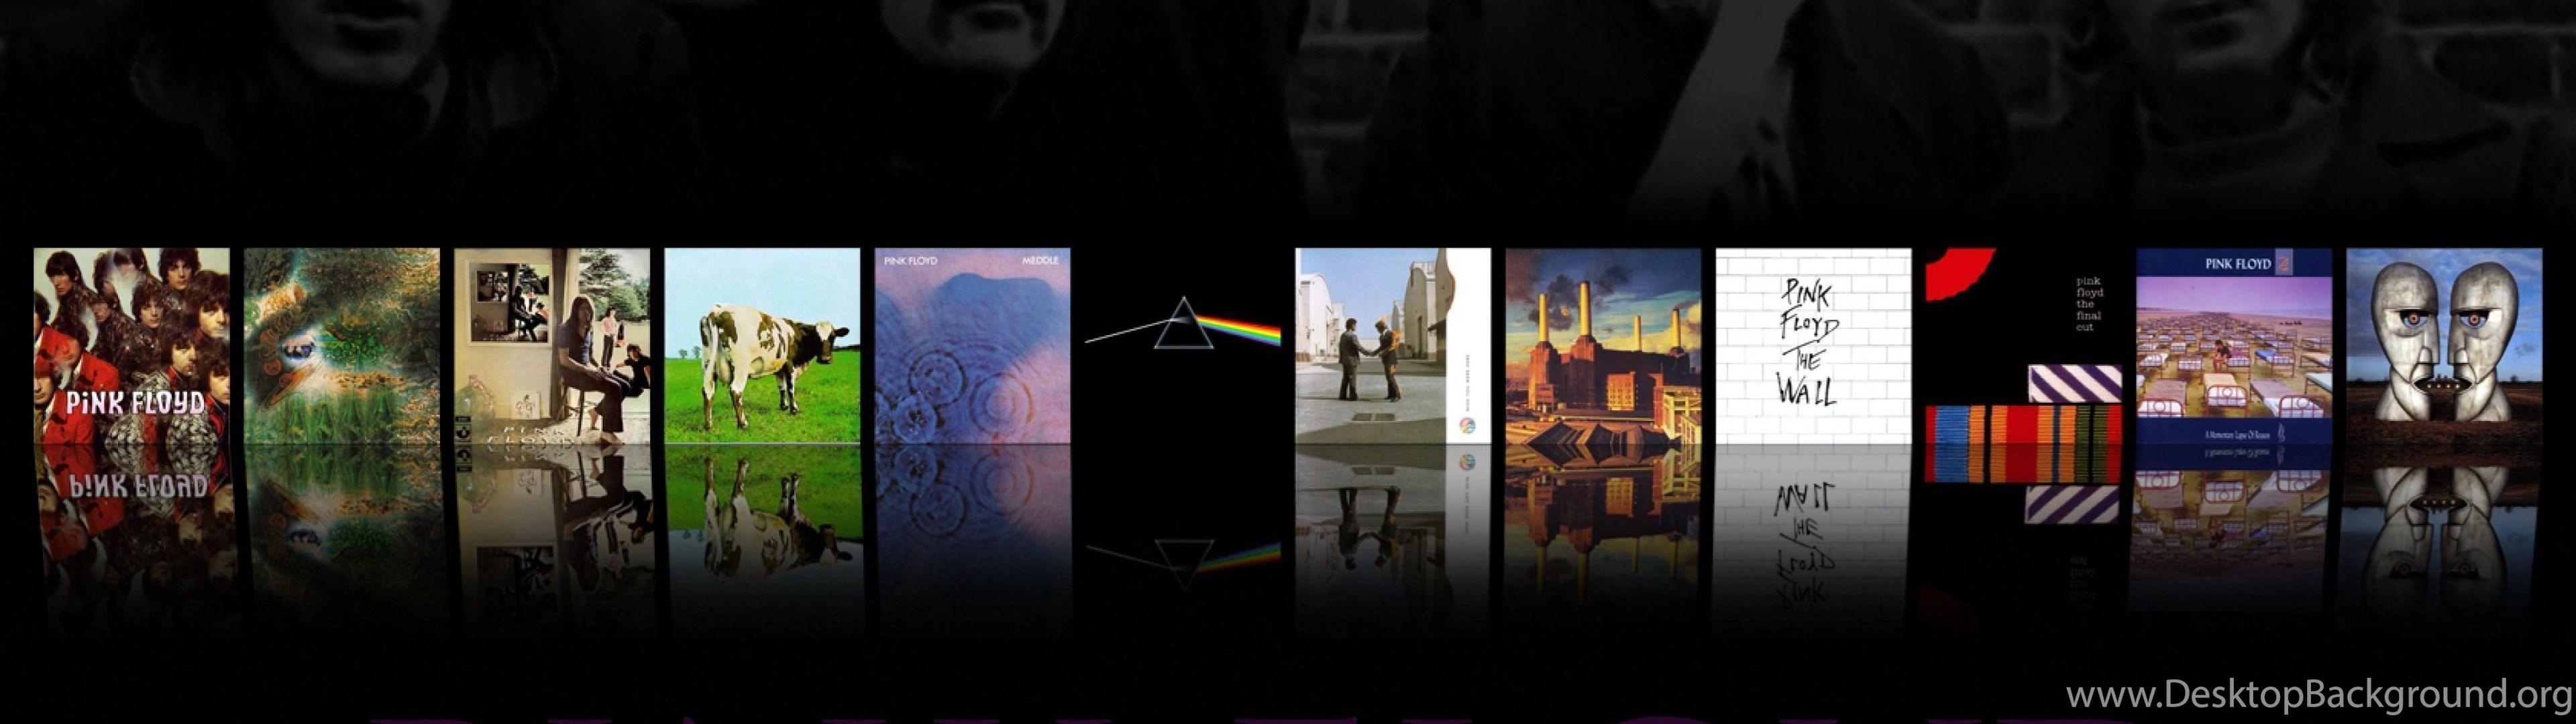 4k Ultra Hd Pink Floyd Wallpapers Hd Desktop Backgrounds 3840x2160